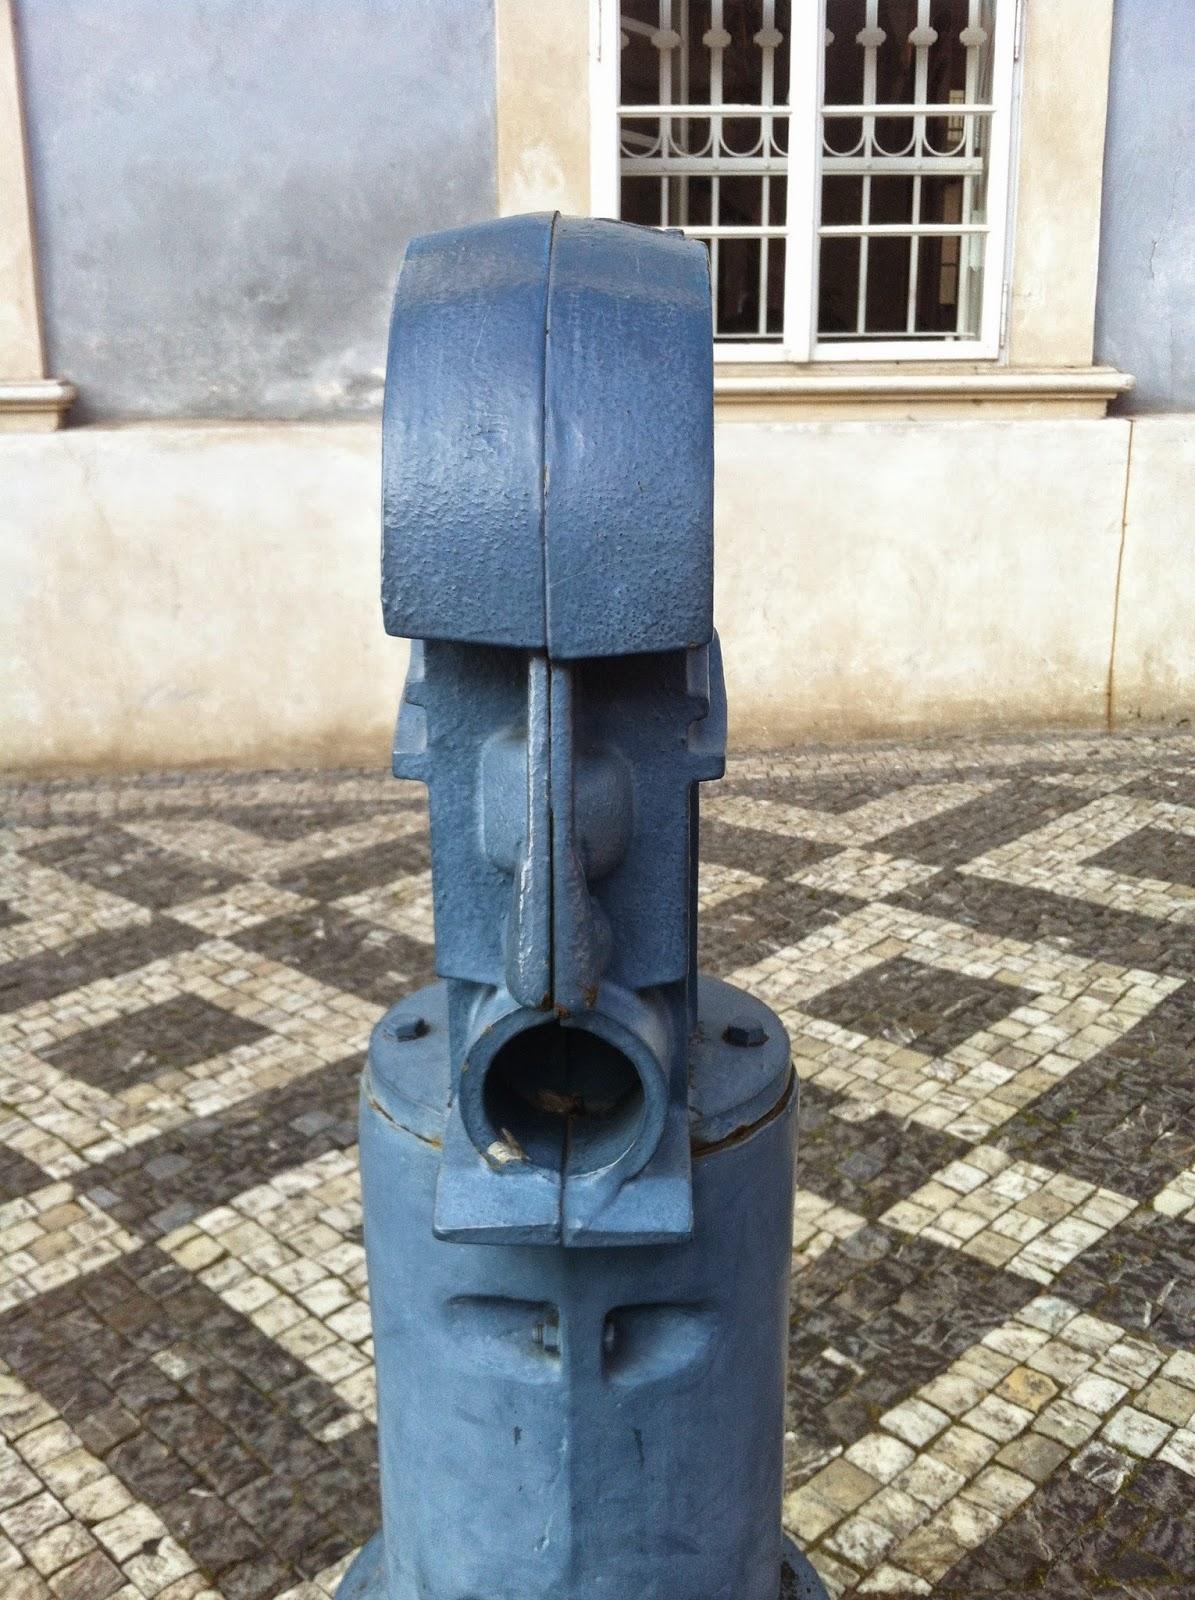 No driving sculptures in Prague